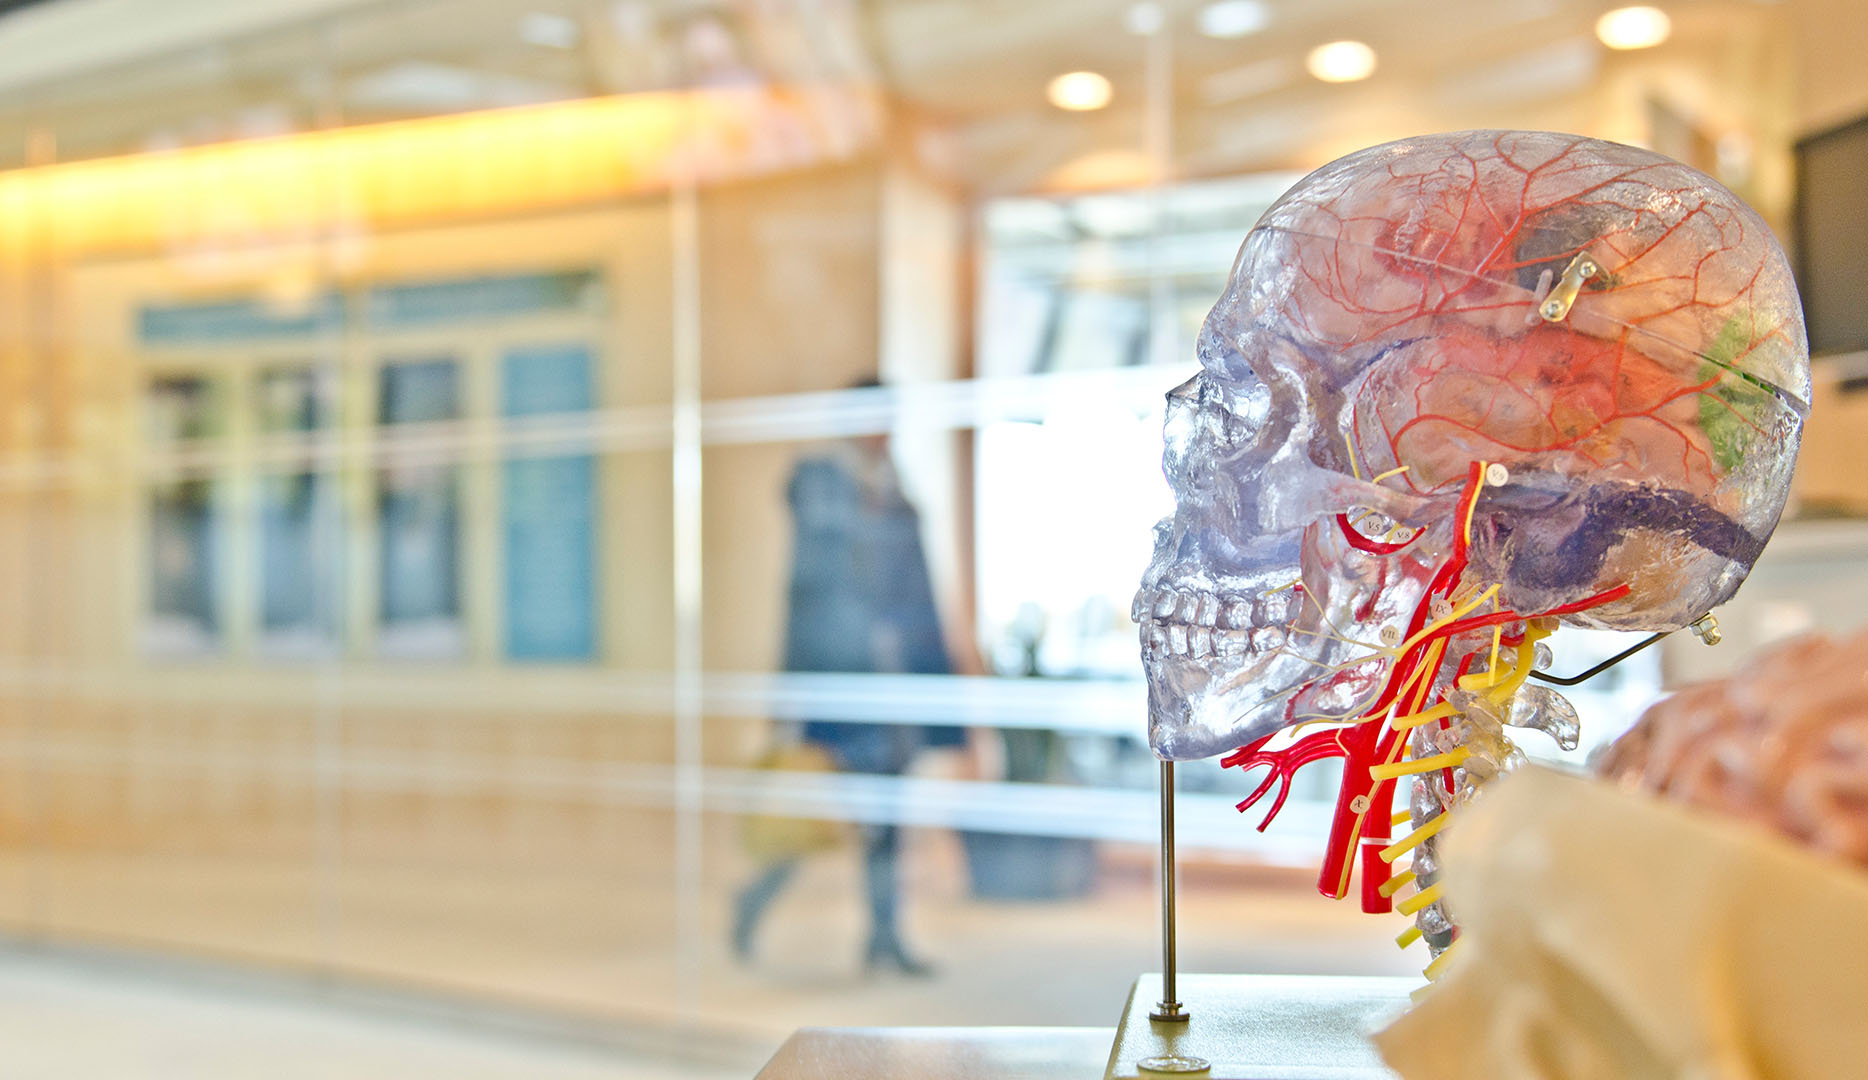 7 Psychological Triggers Every Marketer Should Master